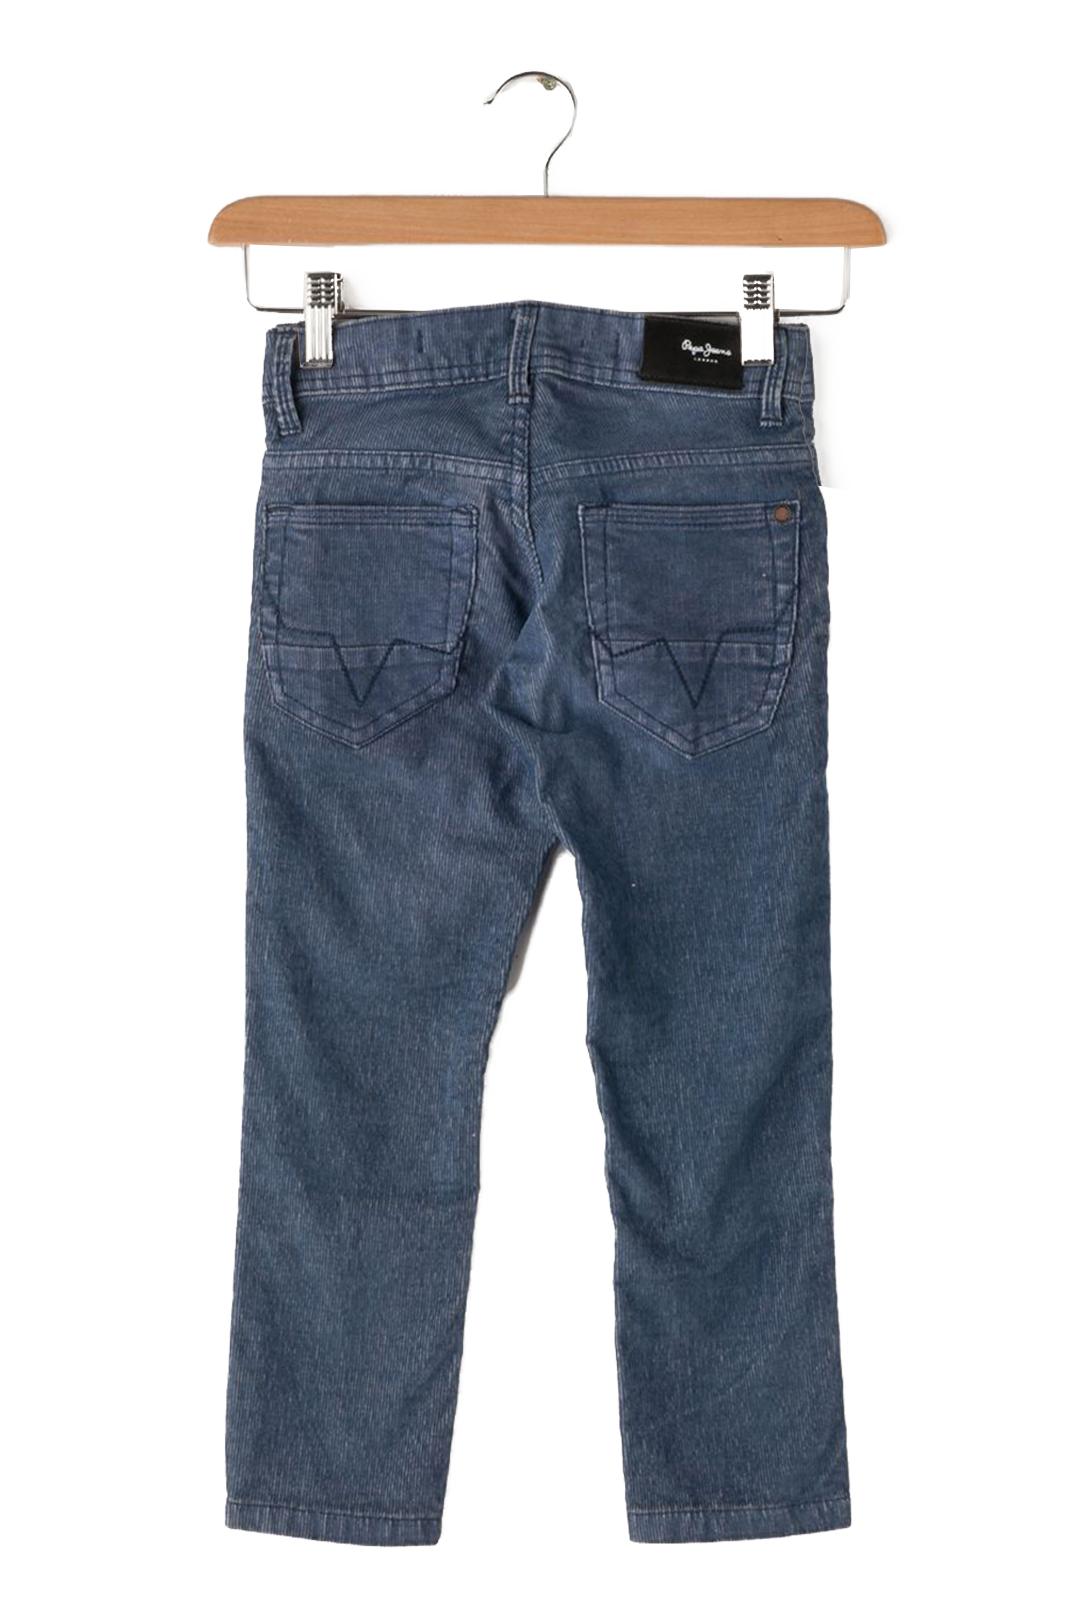 Bas  Pepe jeans PB210263 ron 597